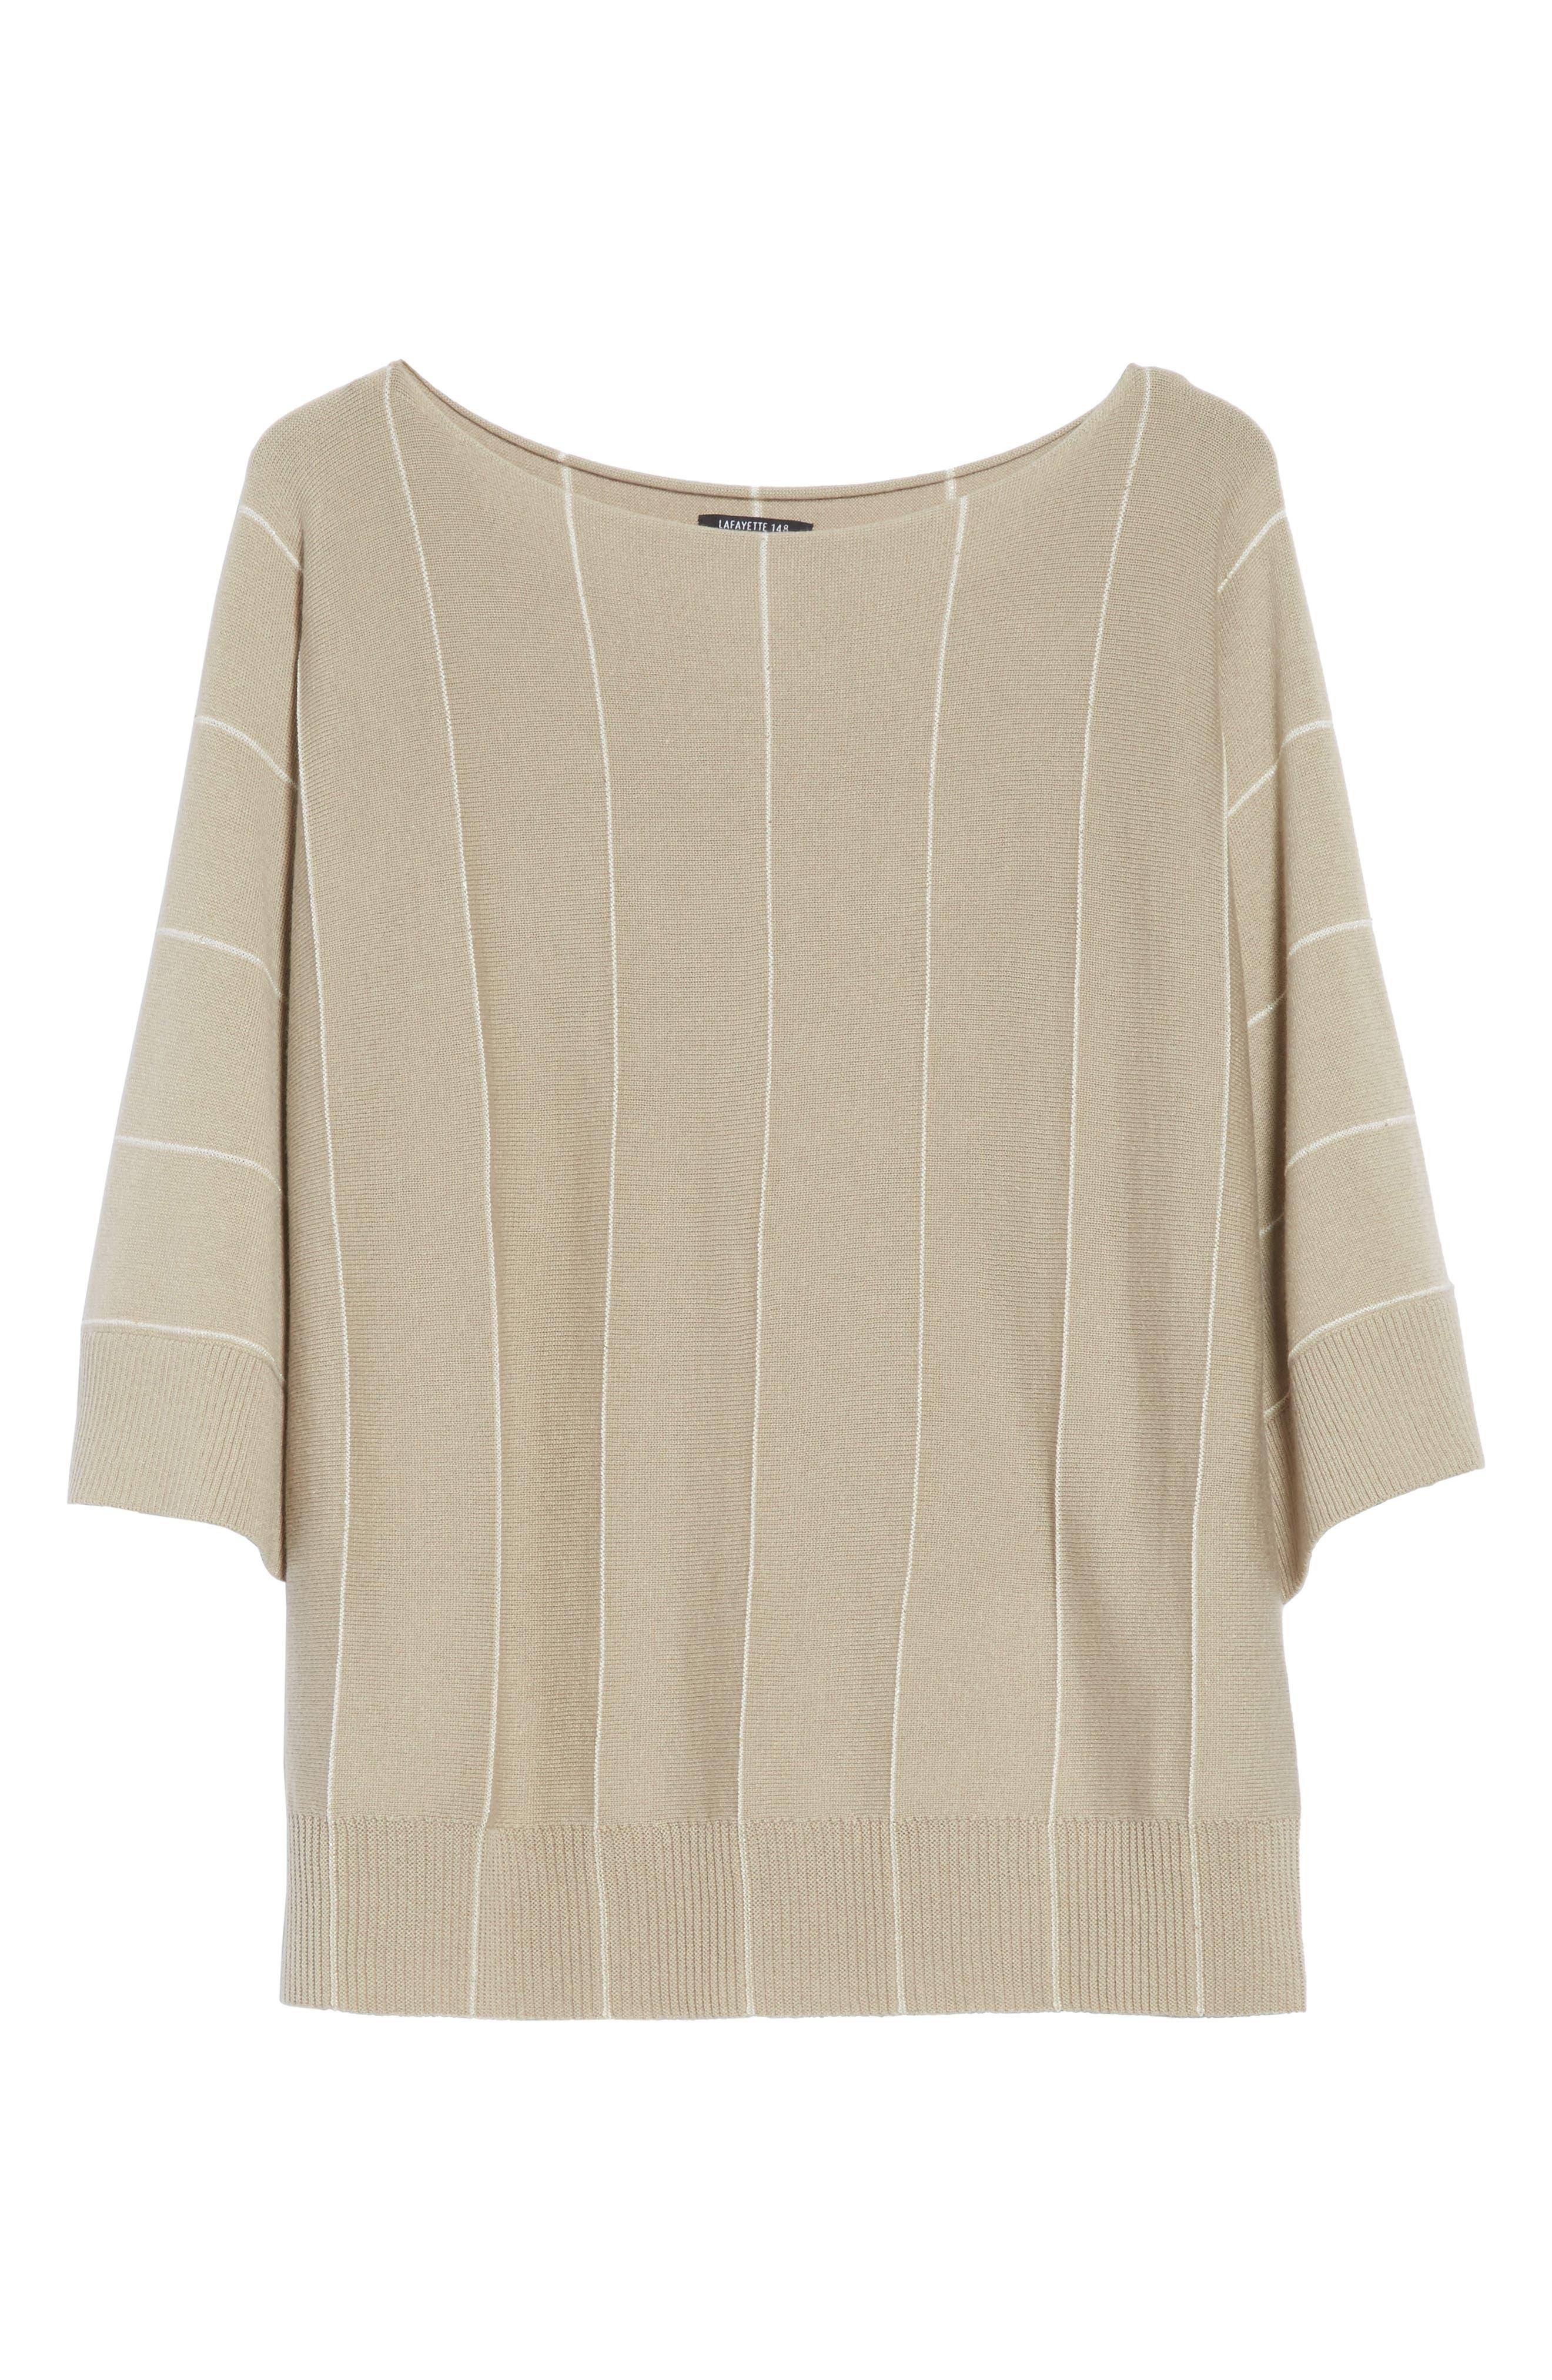 Sequin Knit Cashmere & Silk Pullover,                             Alternate thumbnail 6, color,                             Khaki Multi